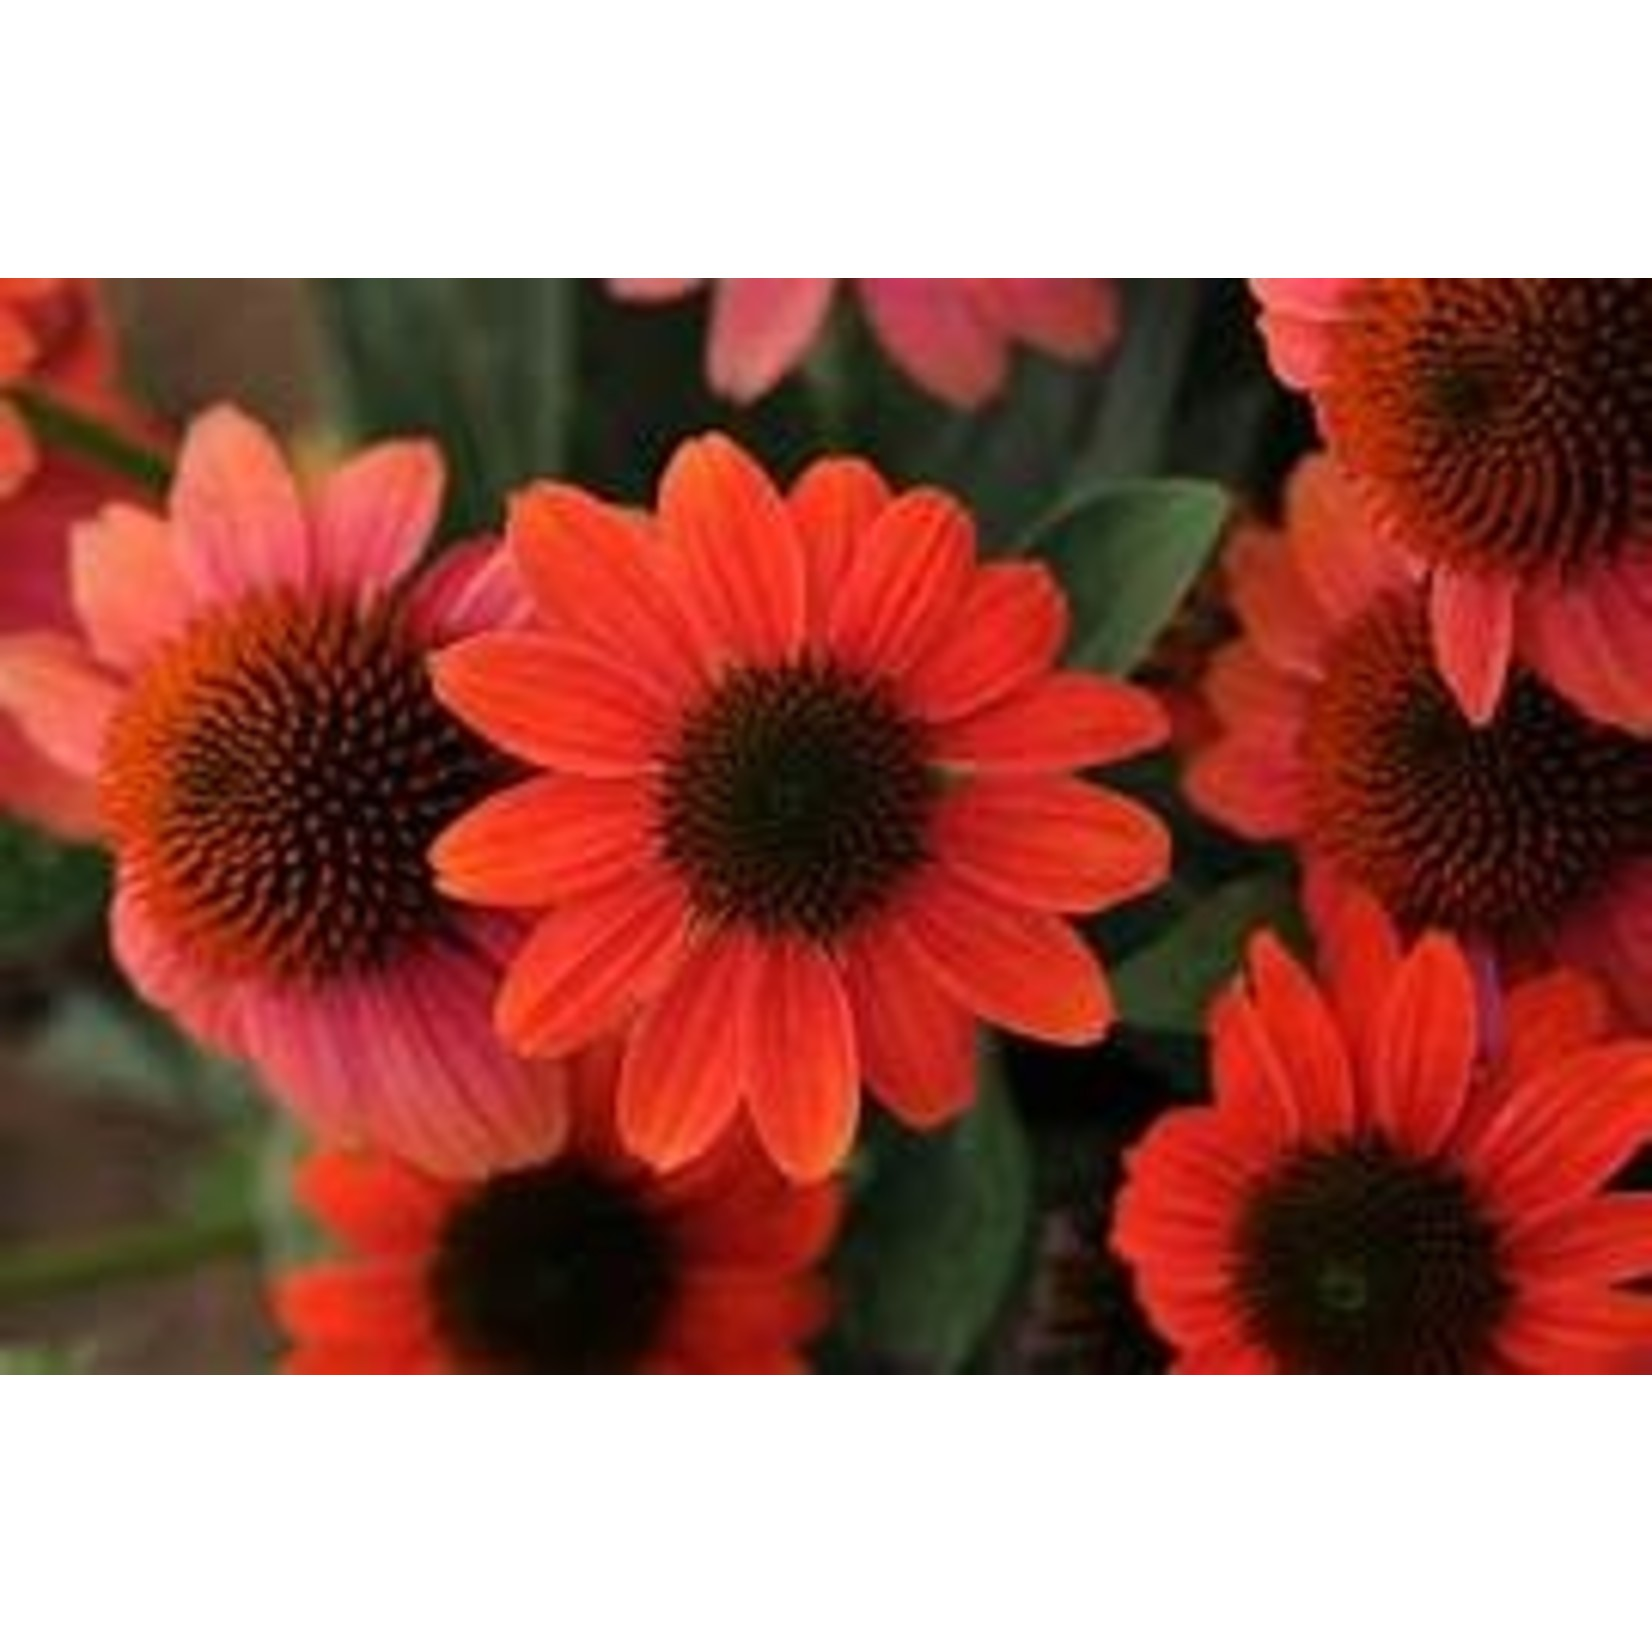 Cone Flower - Echinacea Sombrero Hot Coral - 1 gal